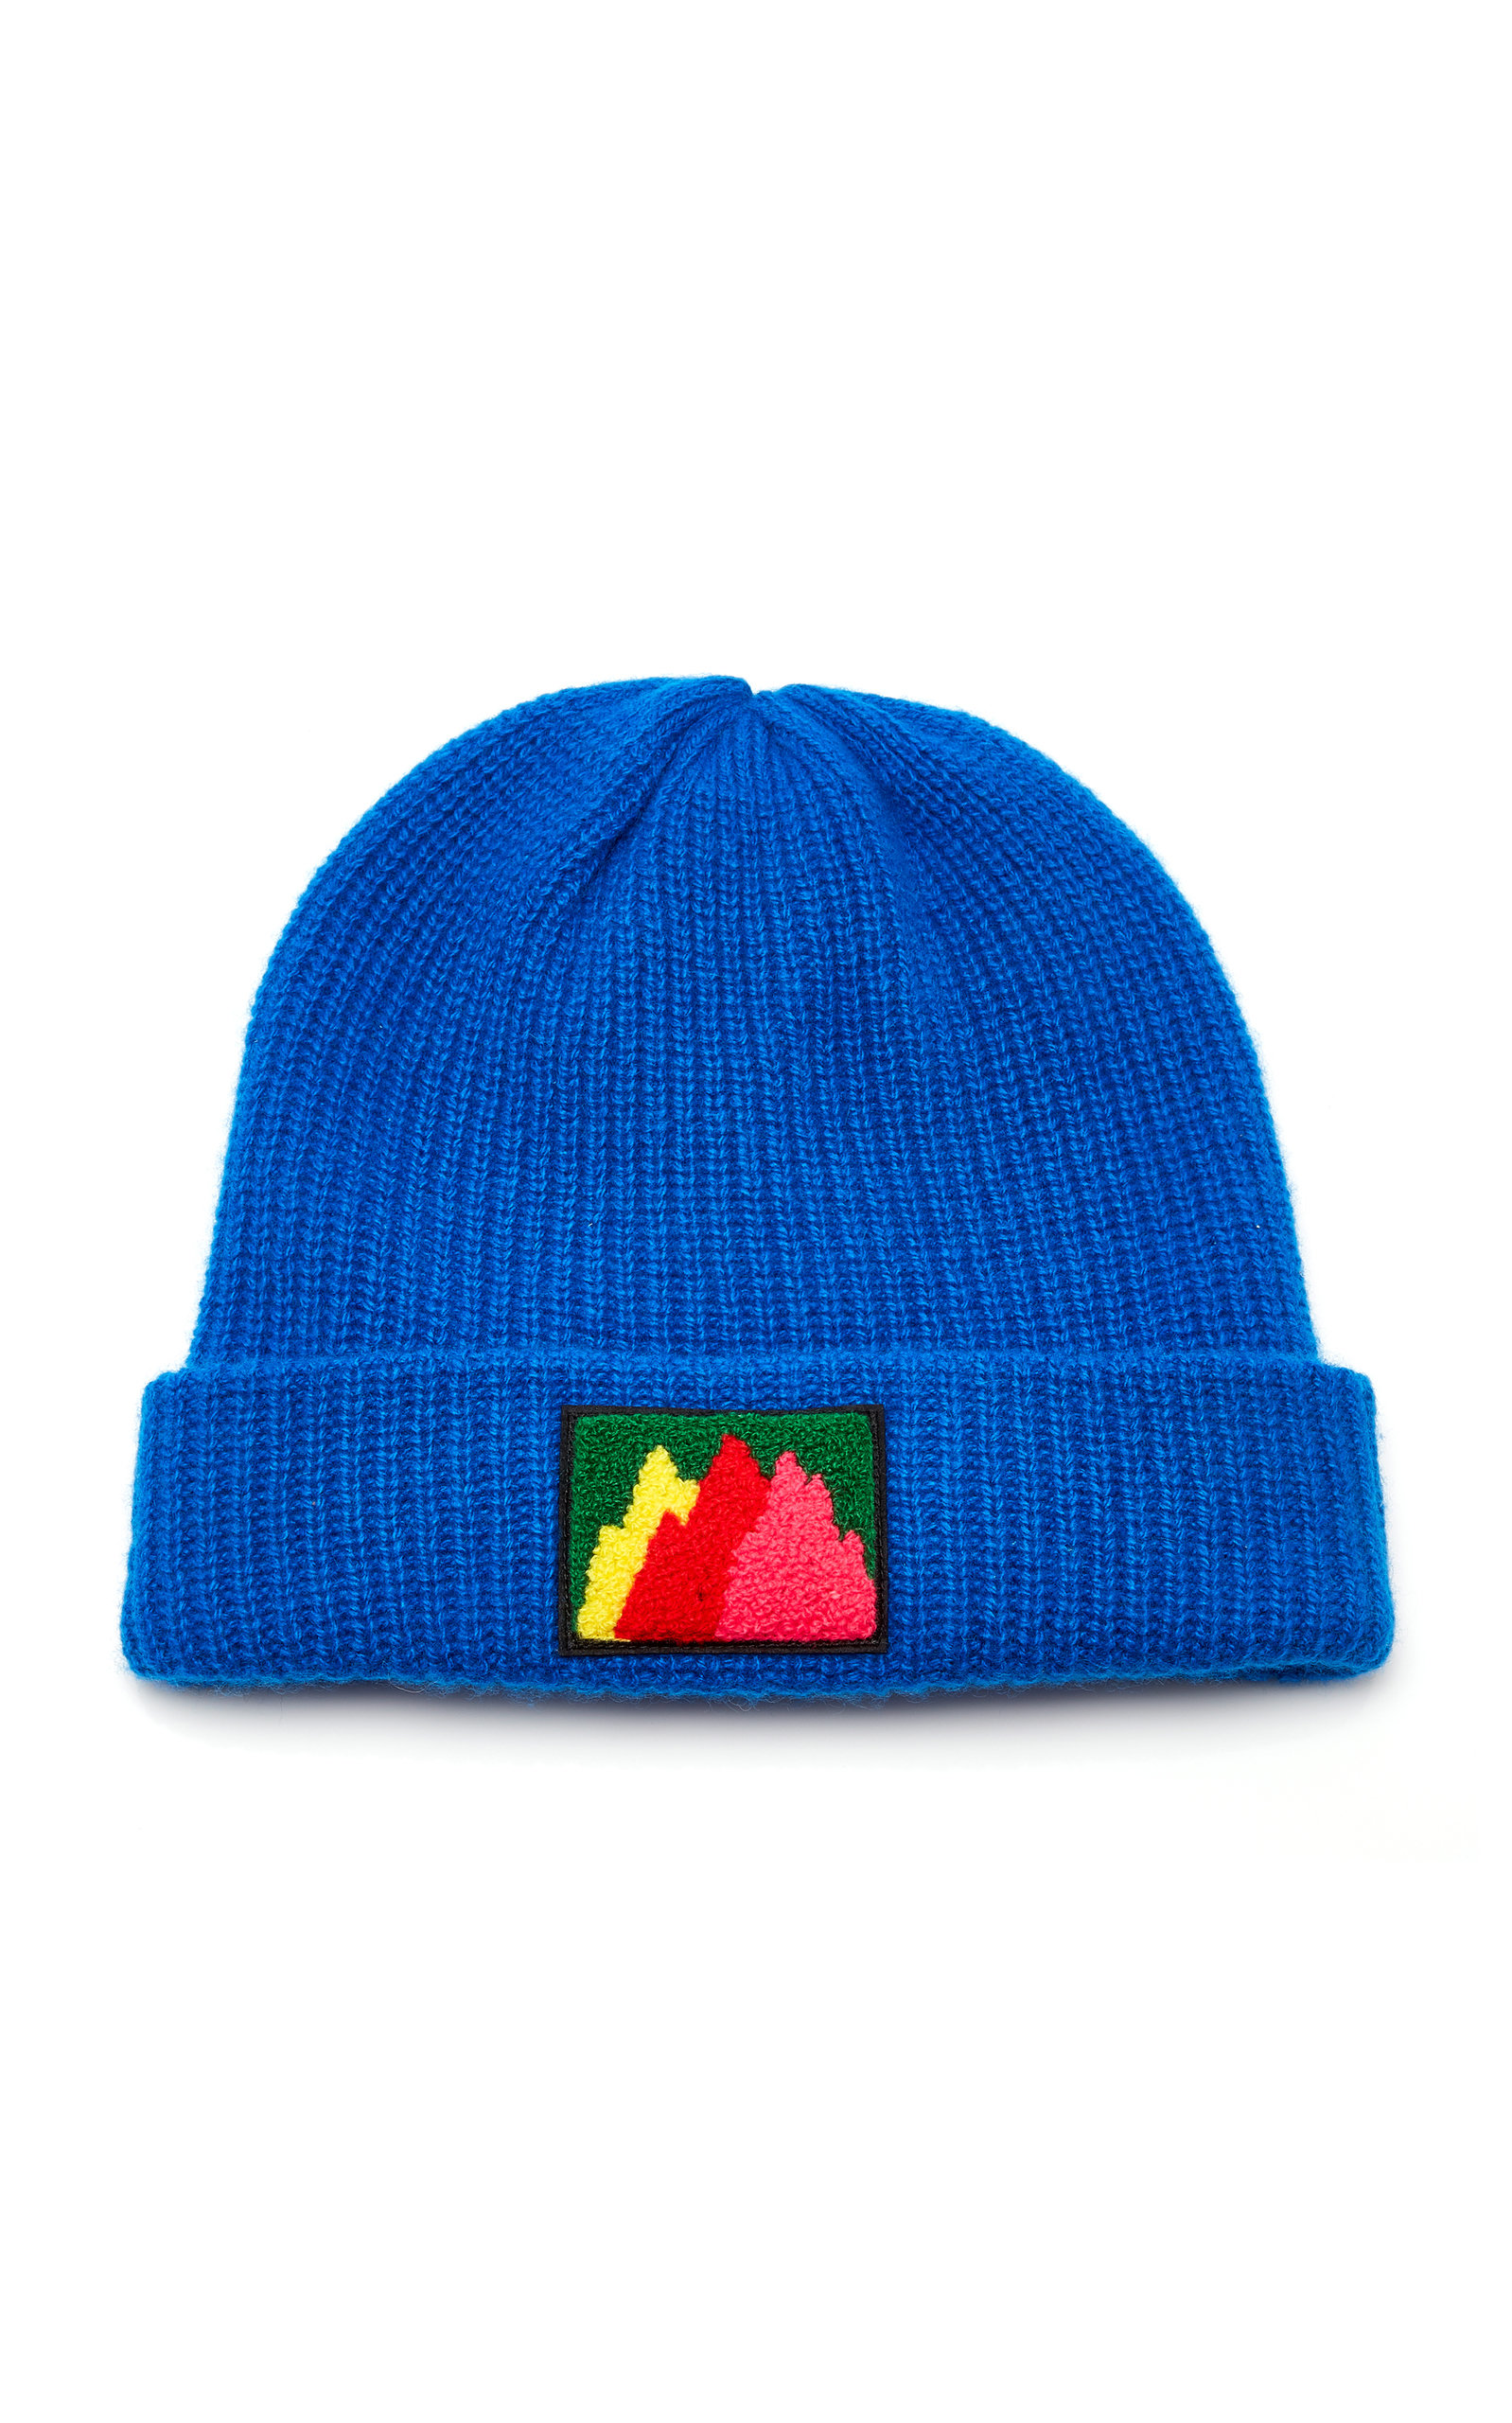 003d2938e2a4ac Watchman Embroidered Cashmere Hat by The Elder Statesman | Moda Operandi